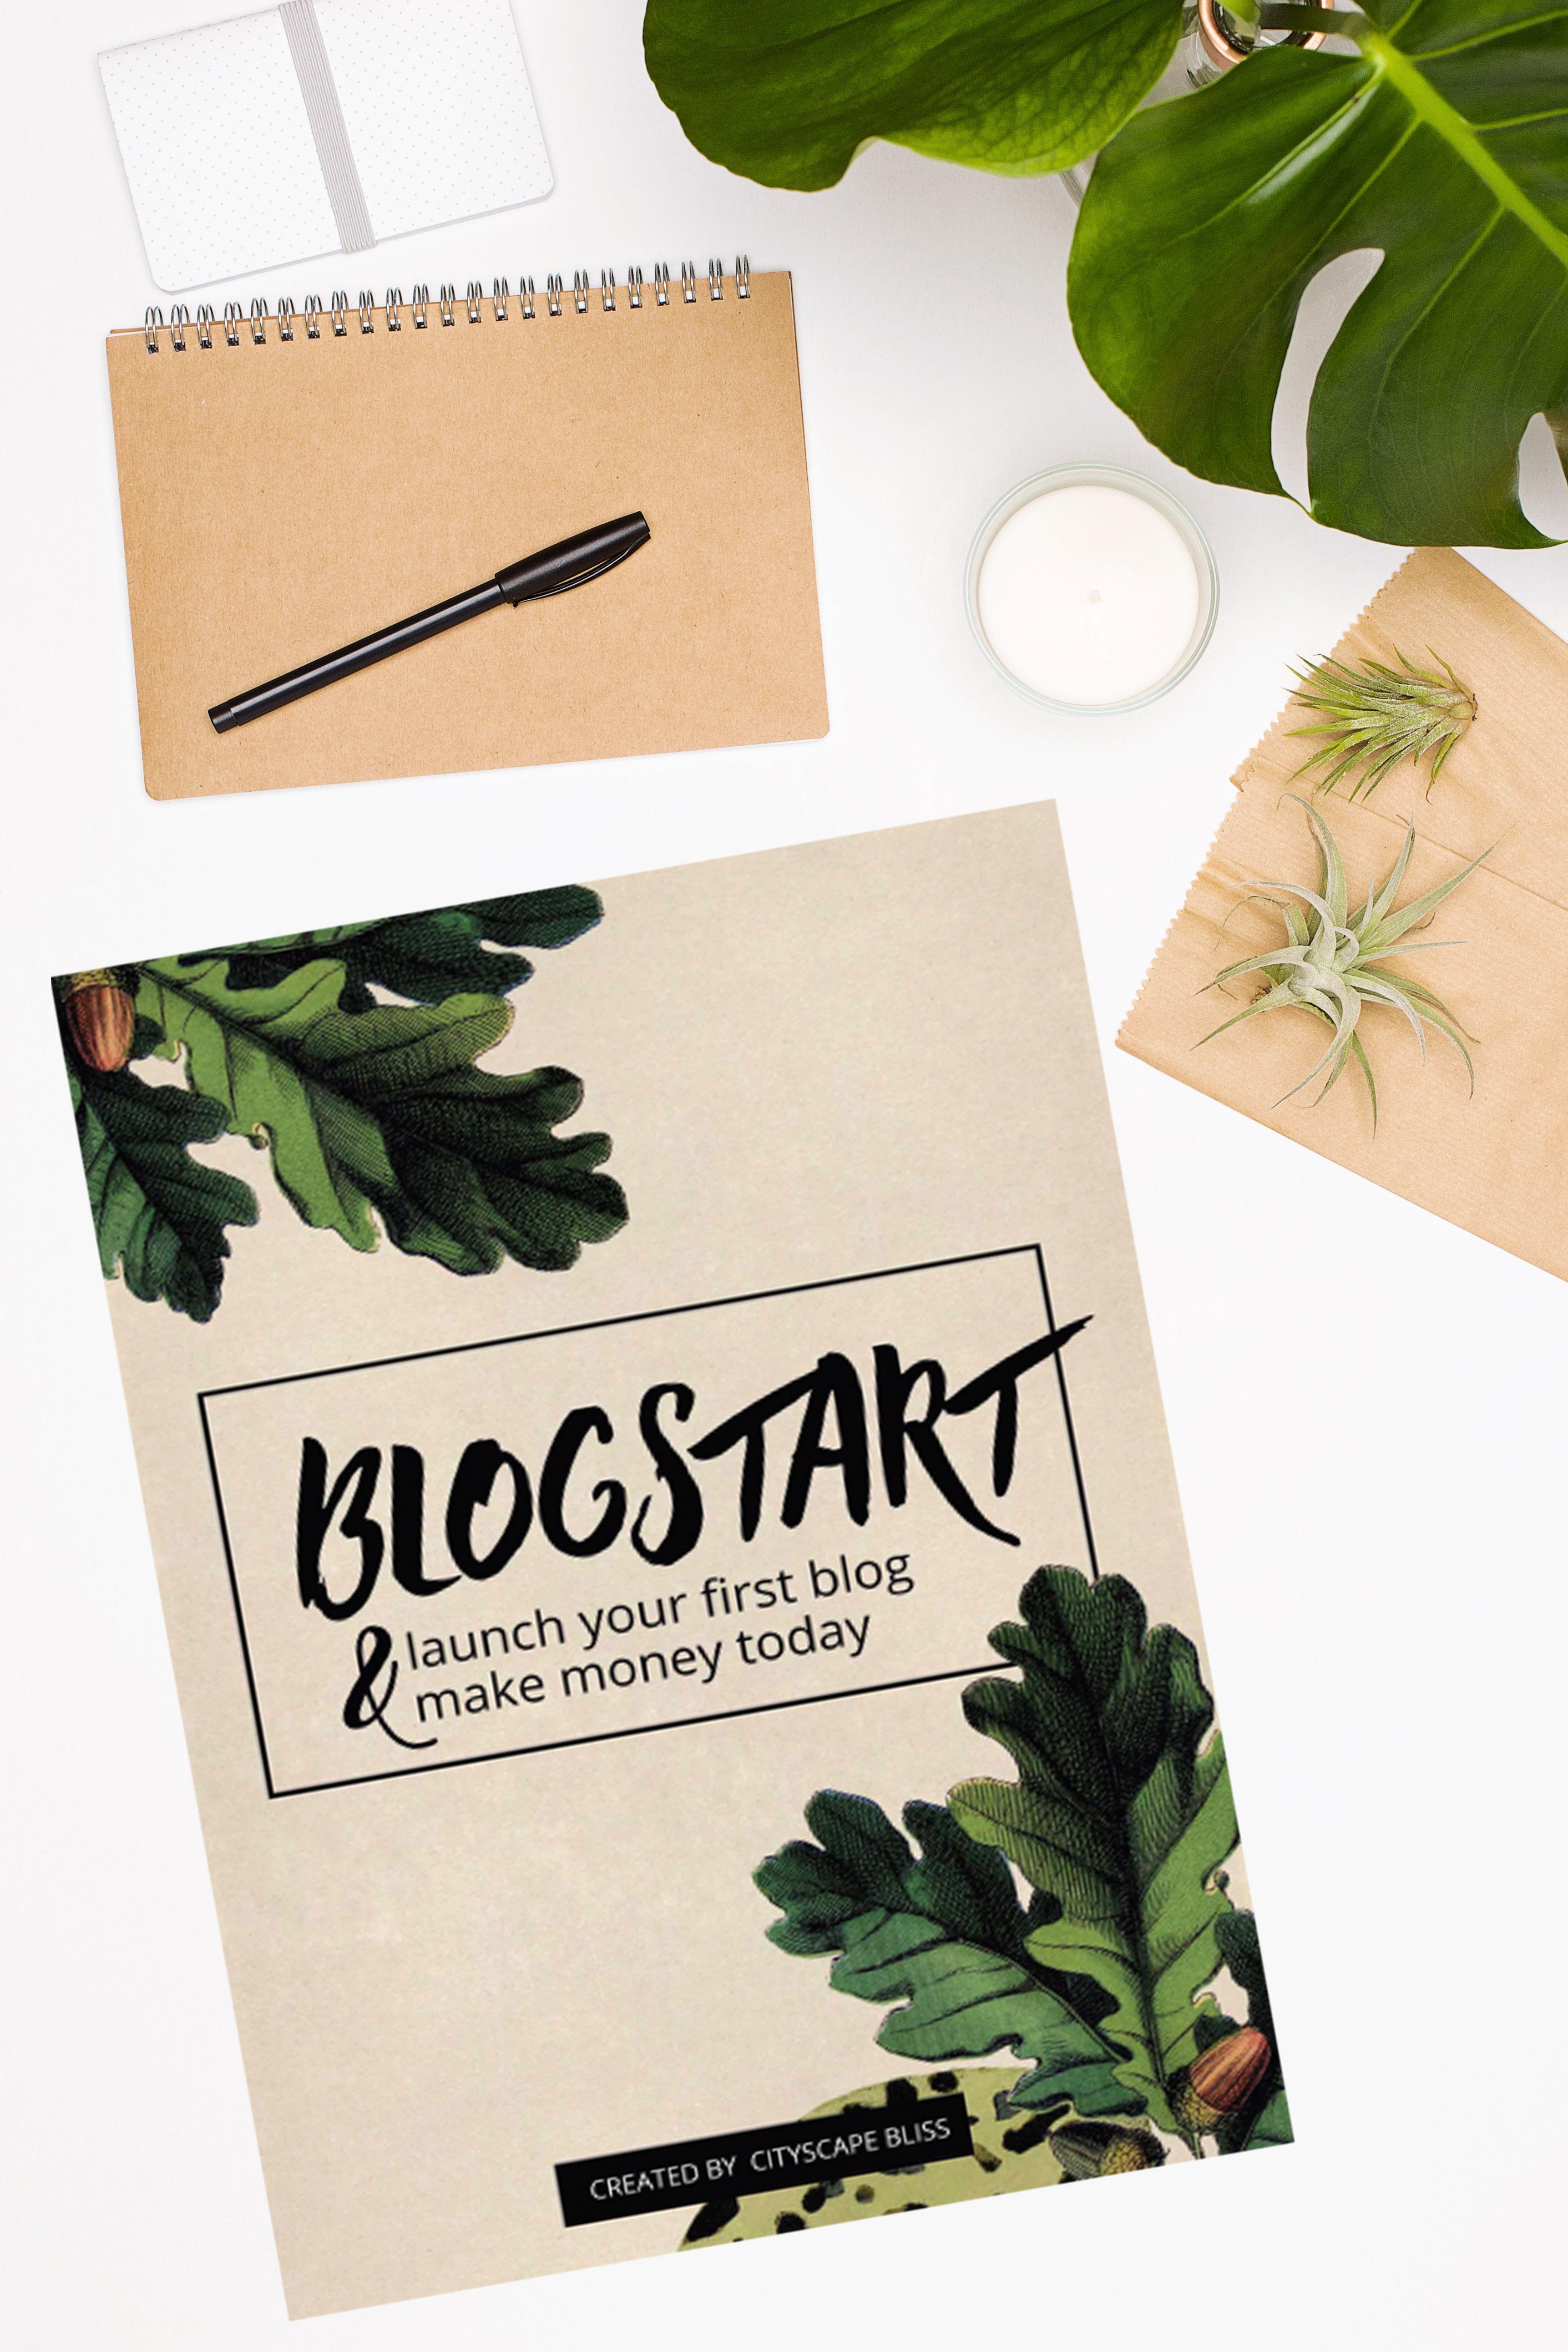 FREE) Blogstart - Launch Your First Blog & Make Money Today [eBook